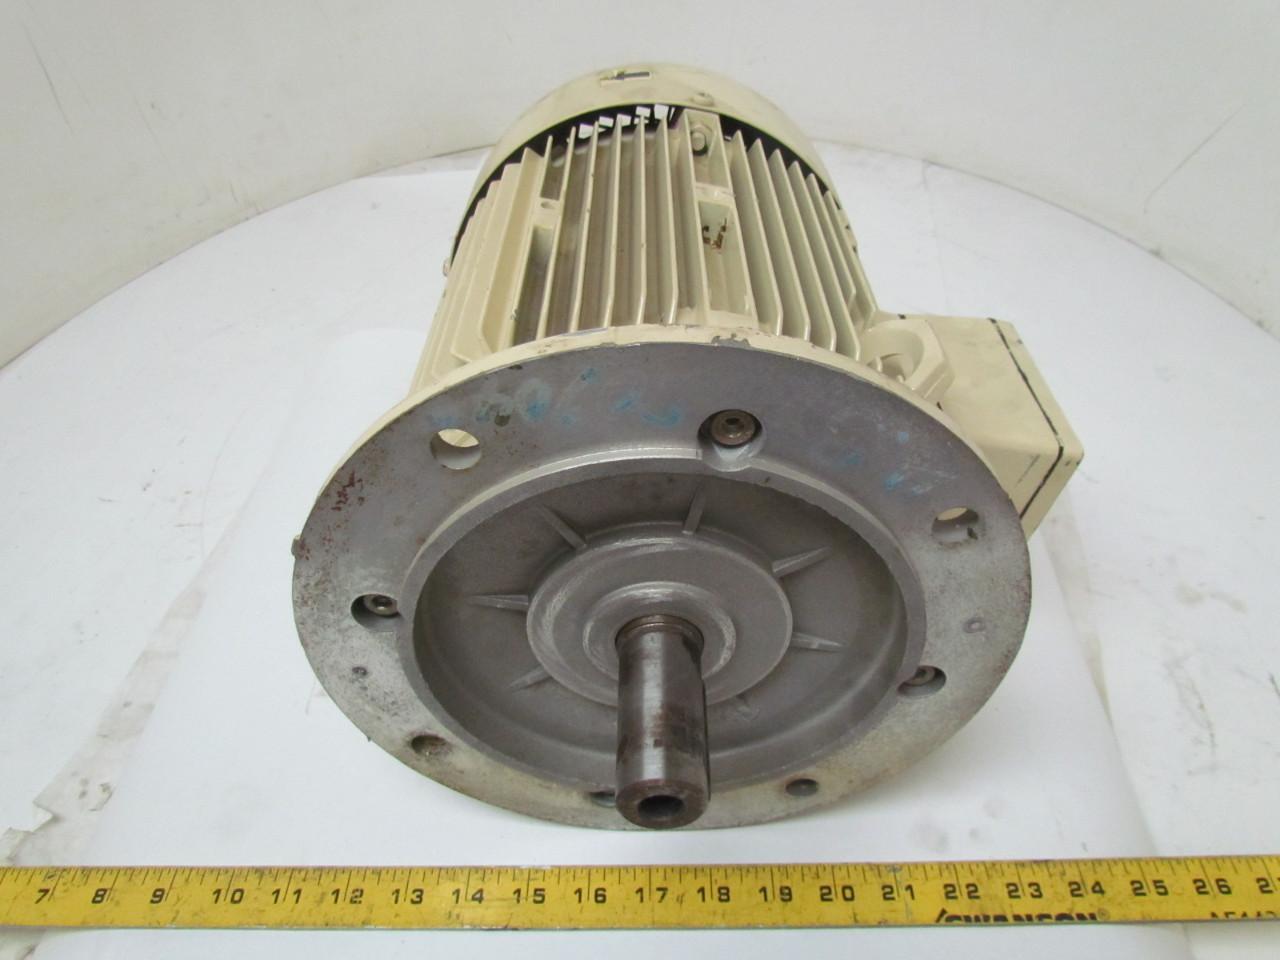 Siemens 4 6 kw tefc 480v 3490 rpm electric motor 112 frame for Iec motor frame size